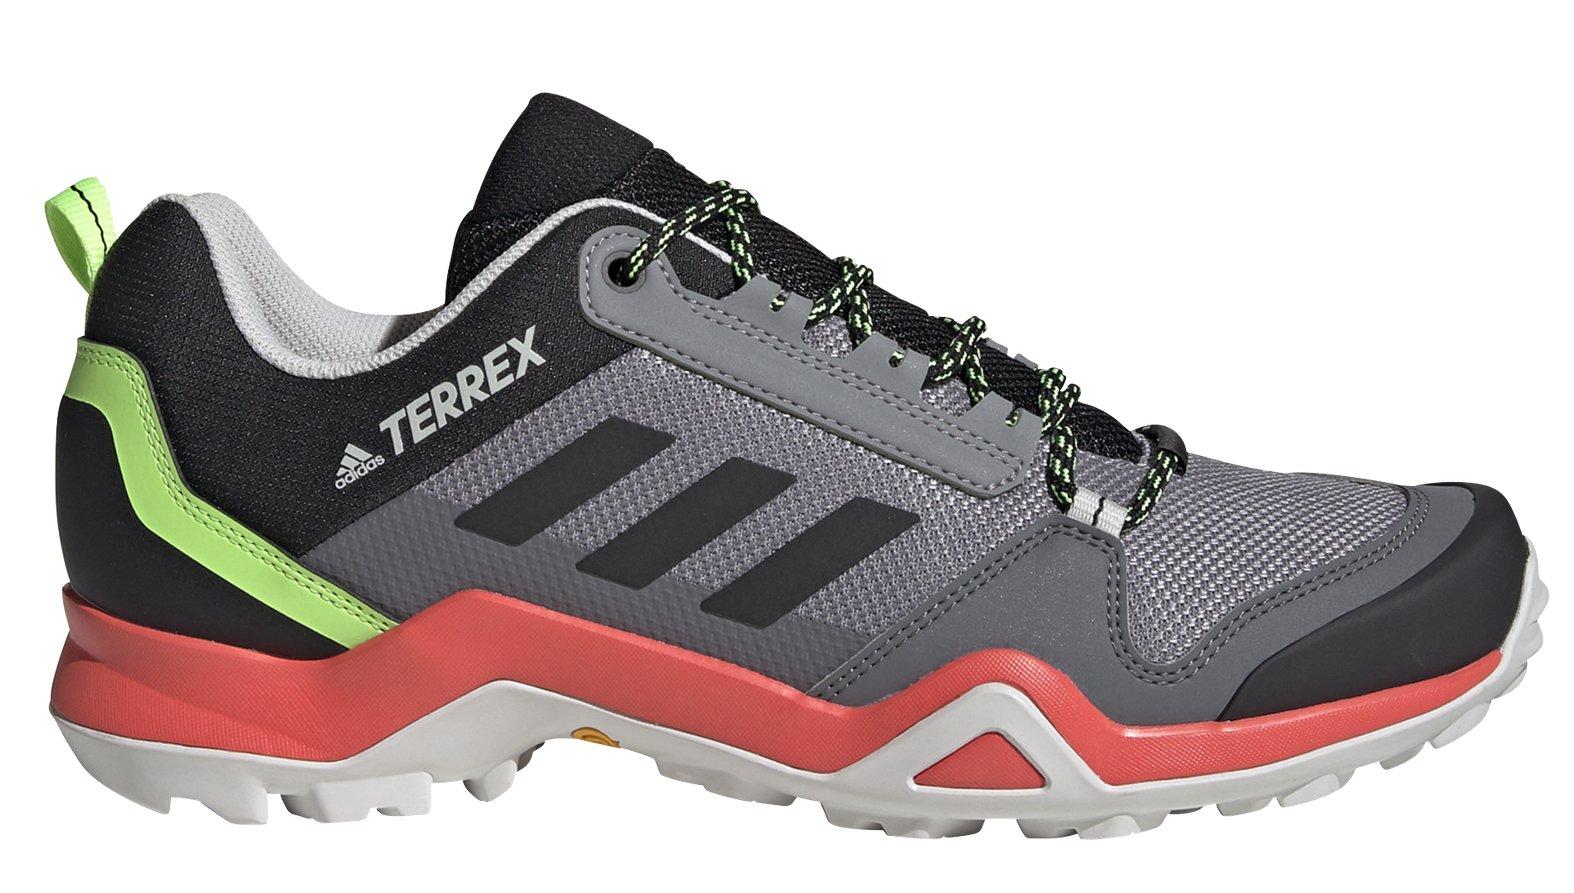 Adidas Terrex AX3 Hiking 48 EUR